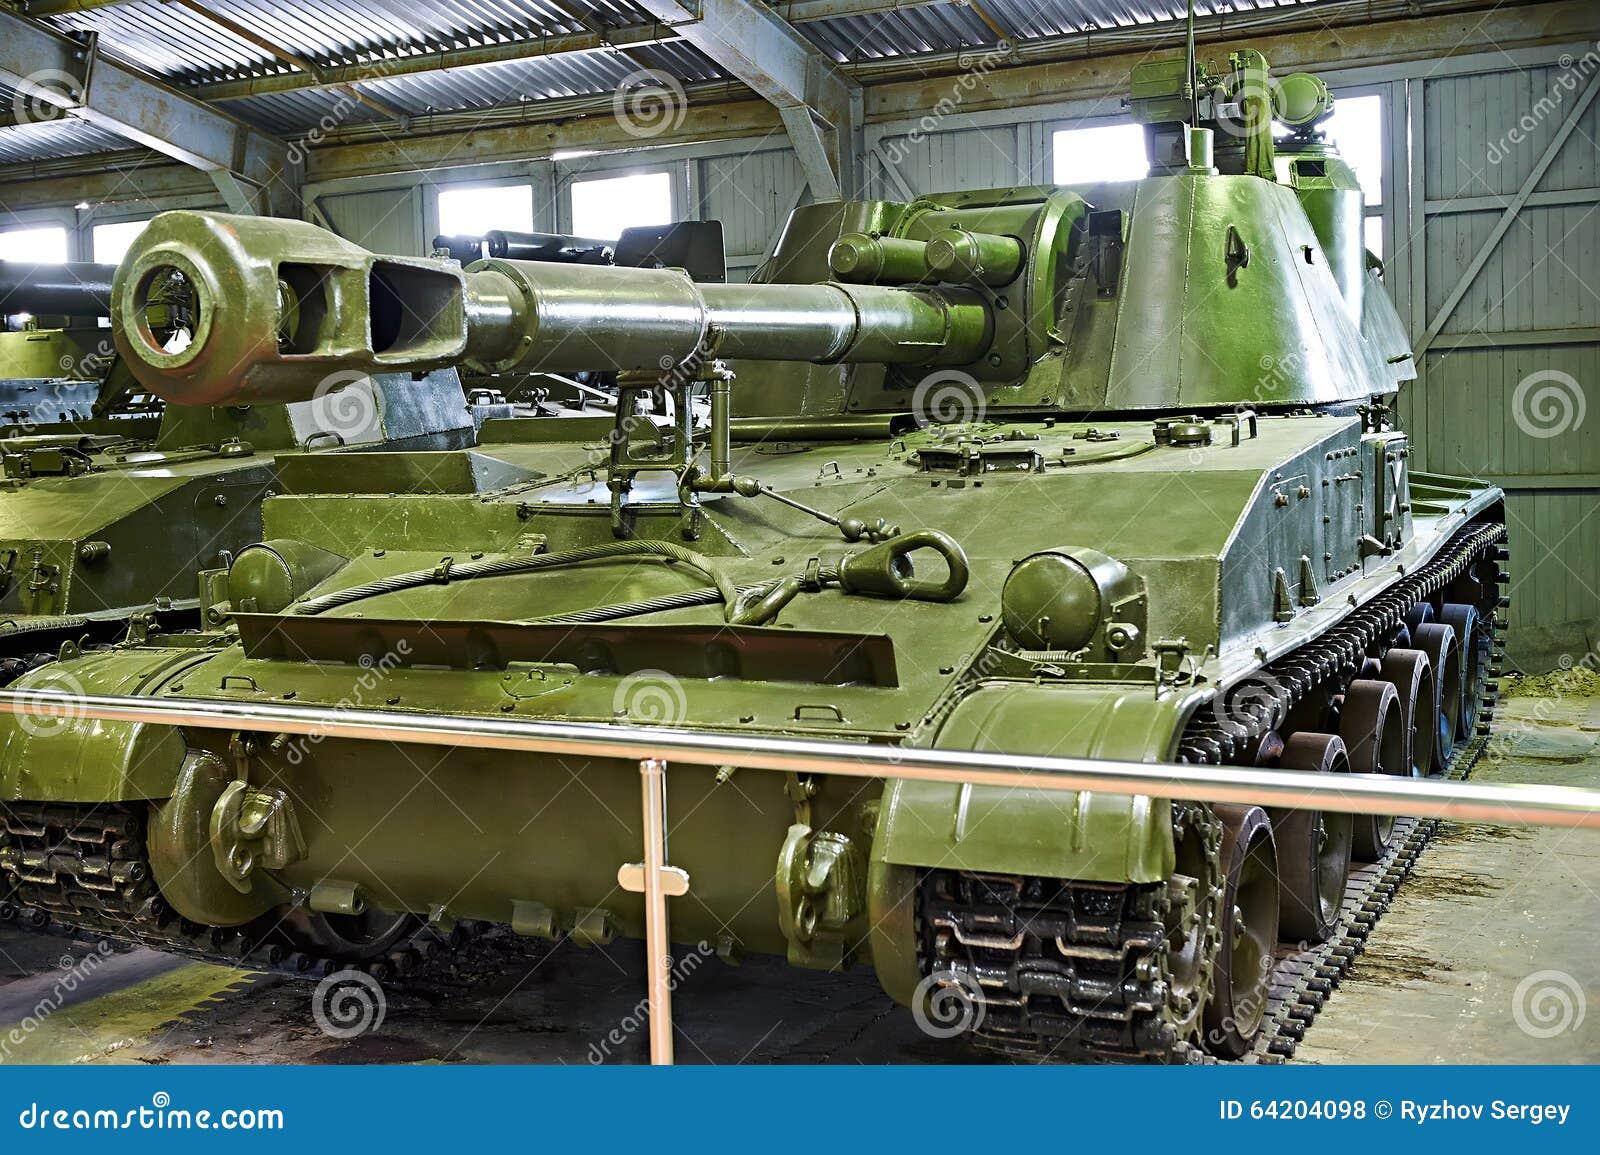 Soviet 152 de SO-152 2S3 Akatsiya 4 milímetros de artillería automotora